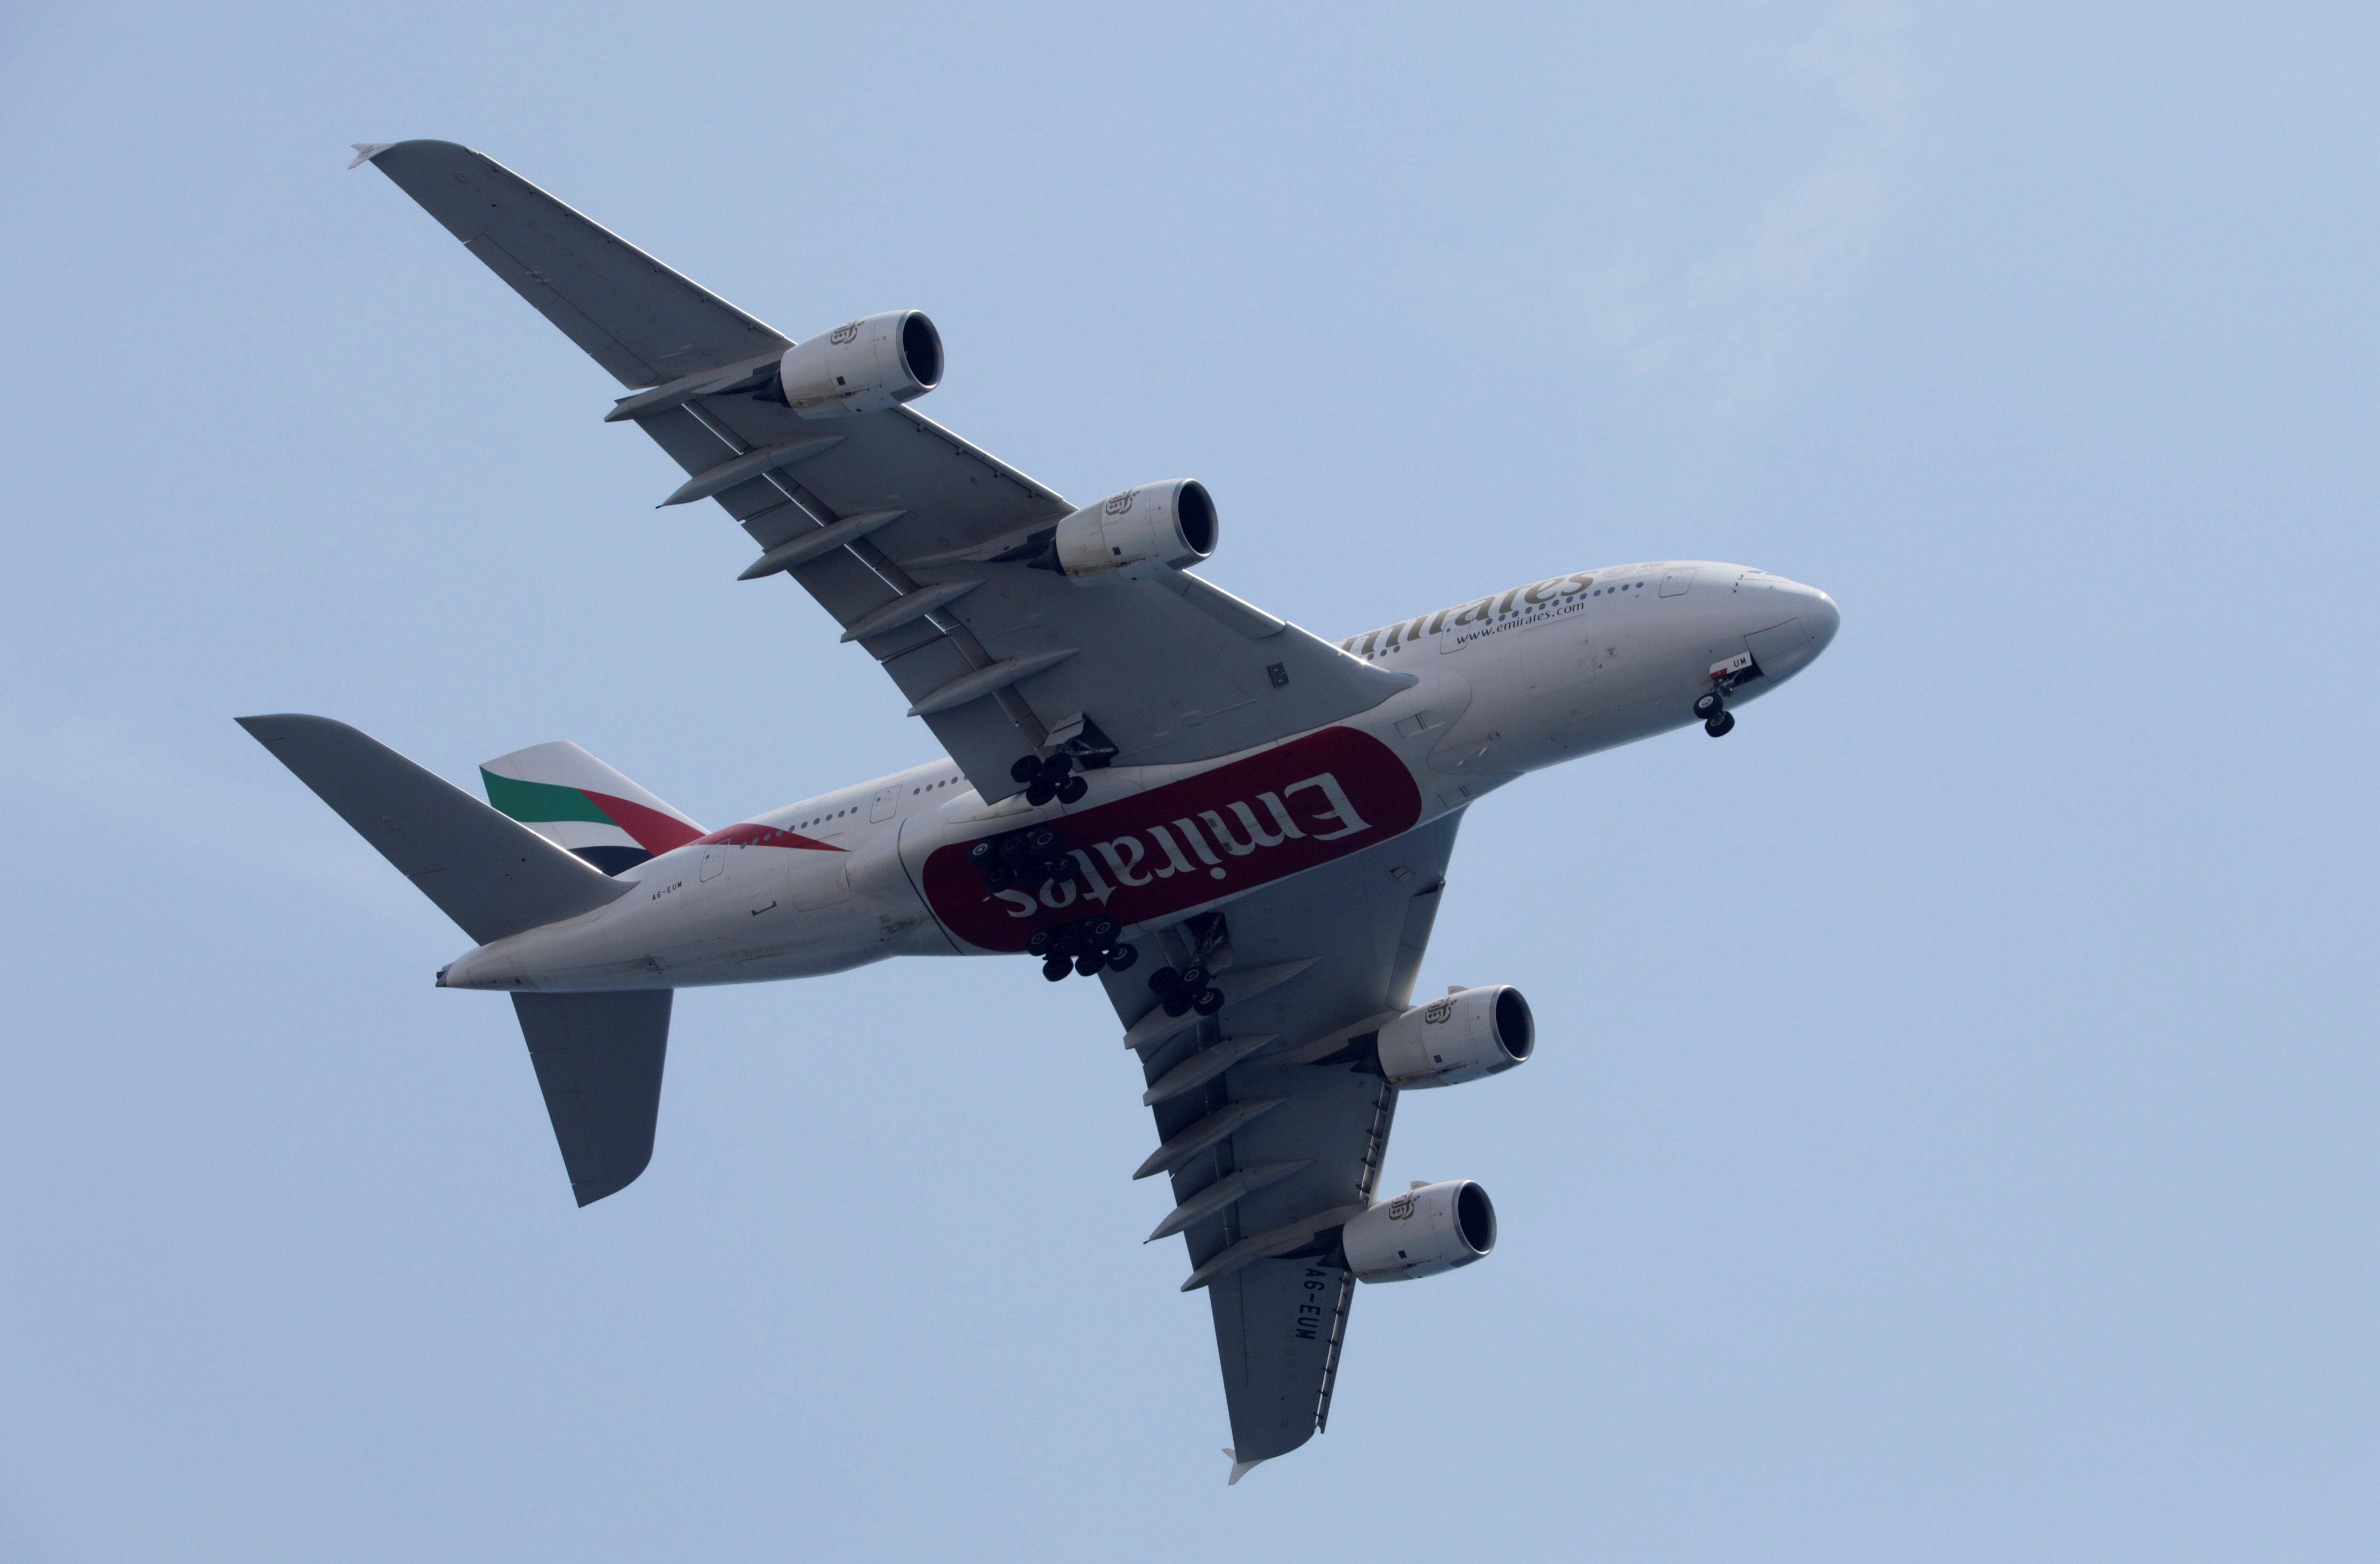 Flight Lands At JFK With 'Dozens' Of Sick Passengers On